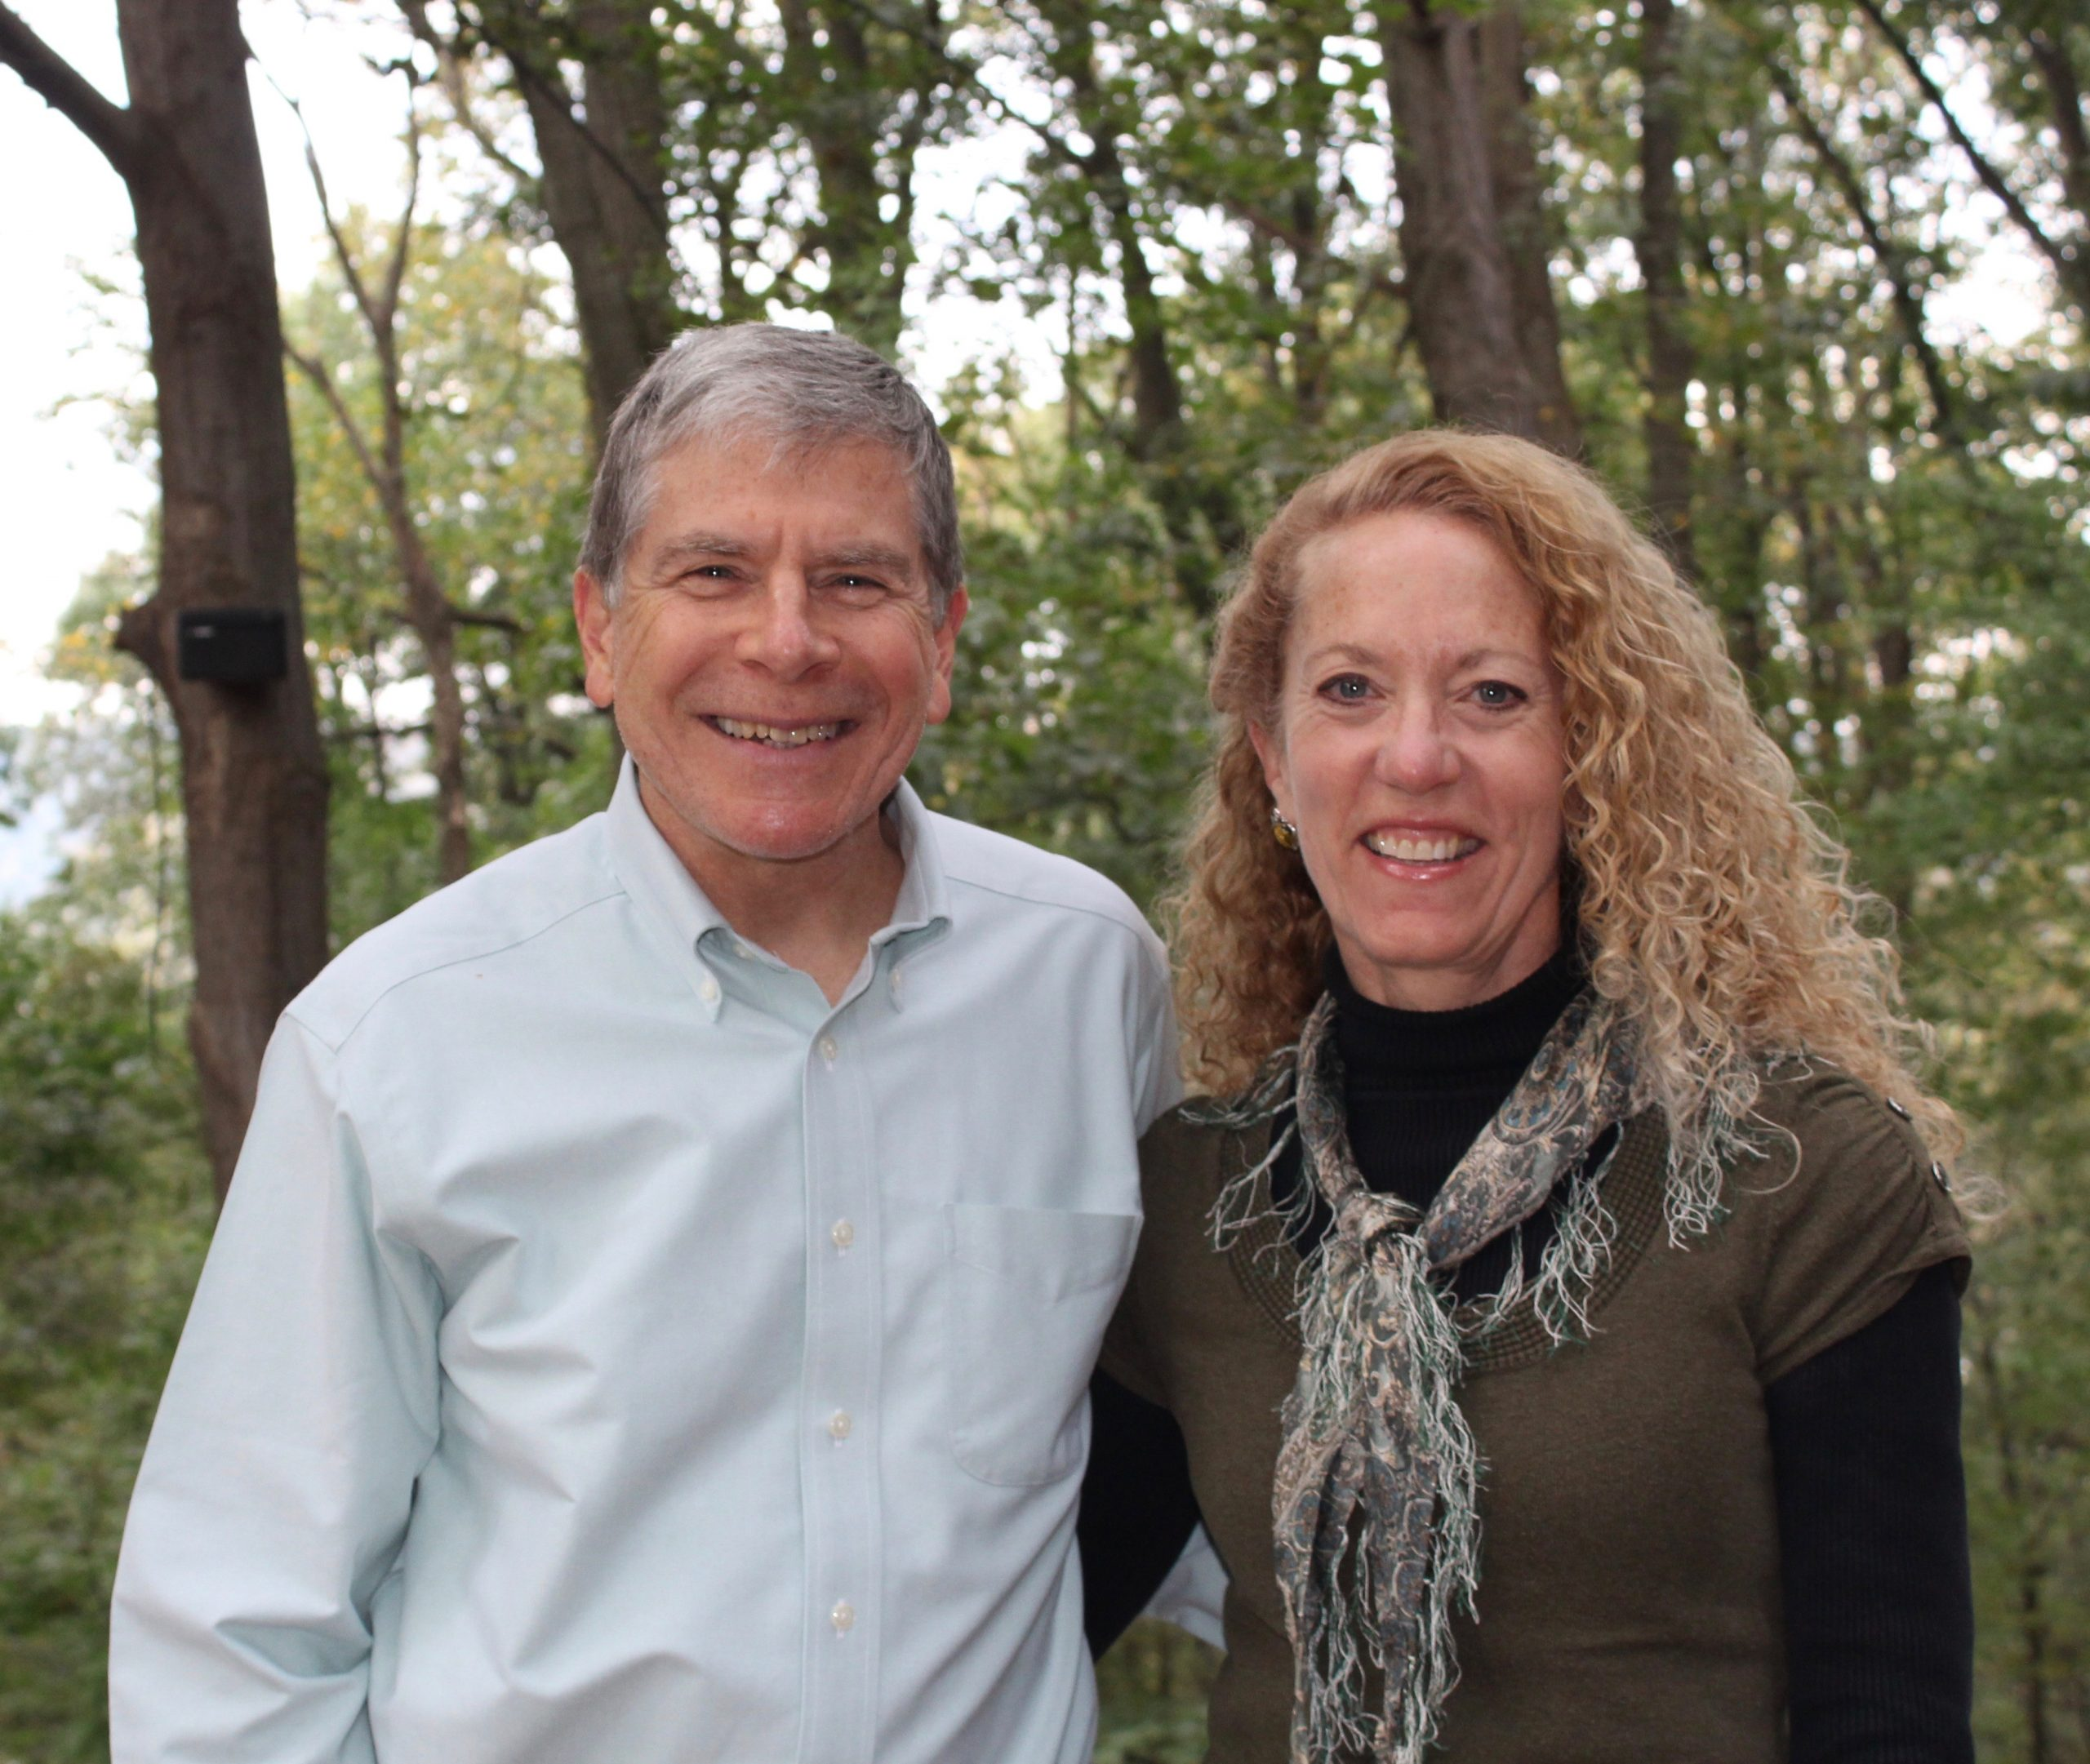 Michael and Debbie Bannon